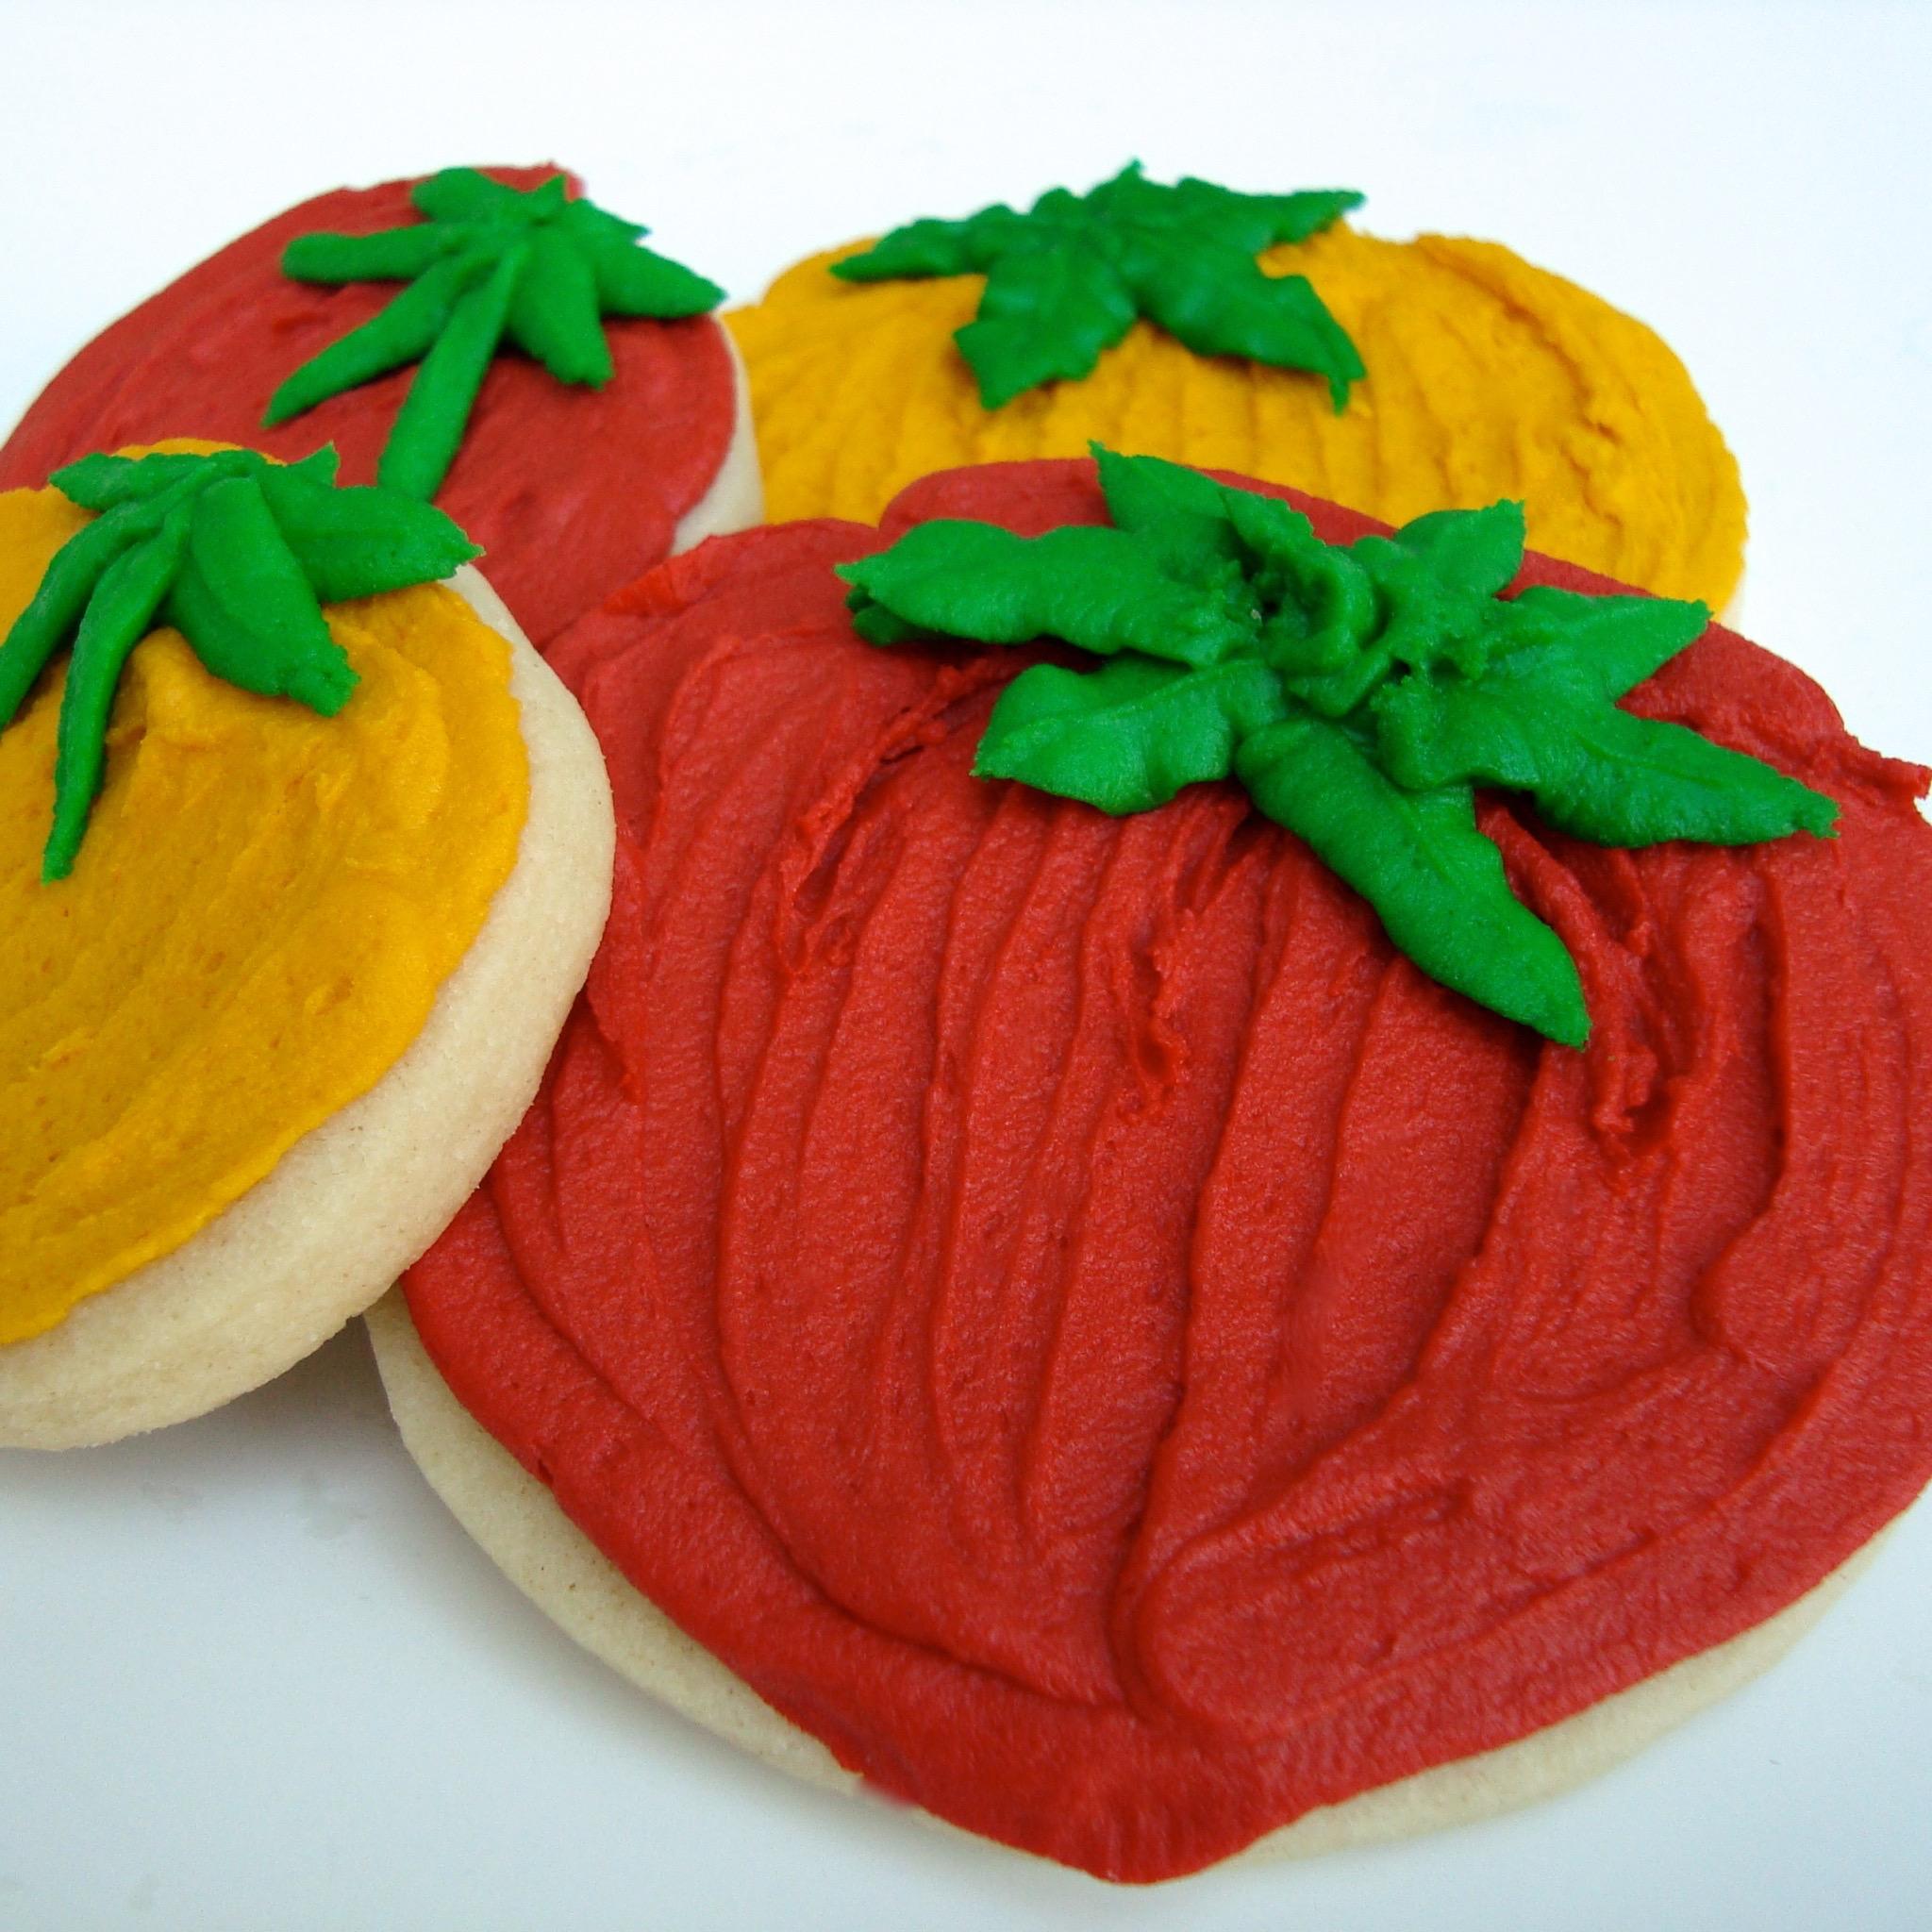 Food.Drink.Cookie.tomato.jpg